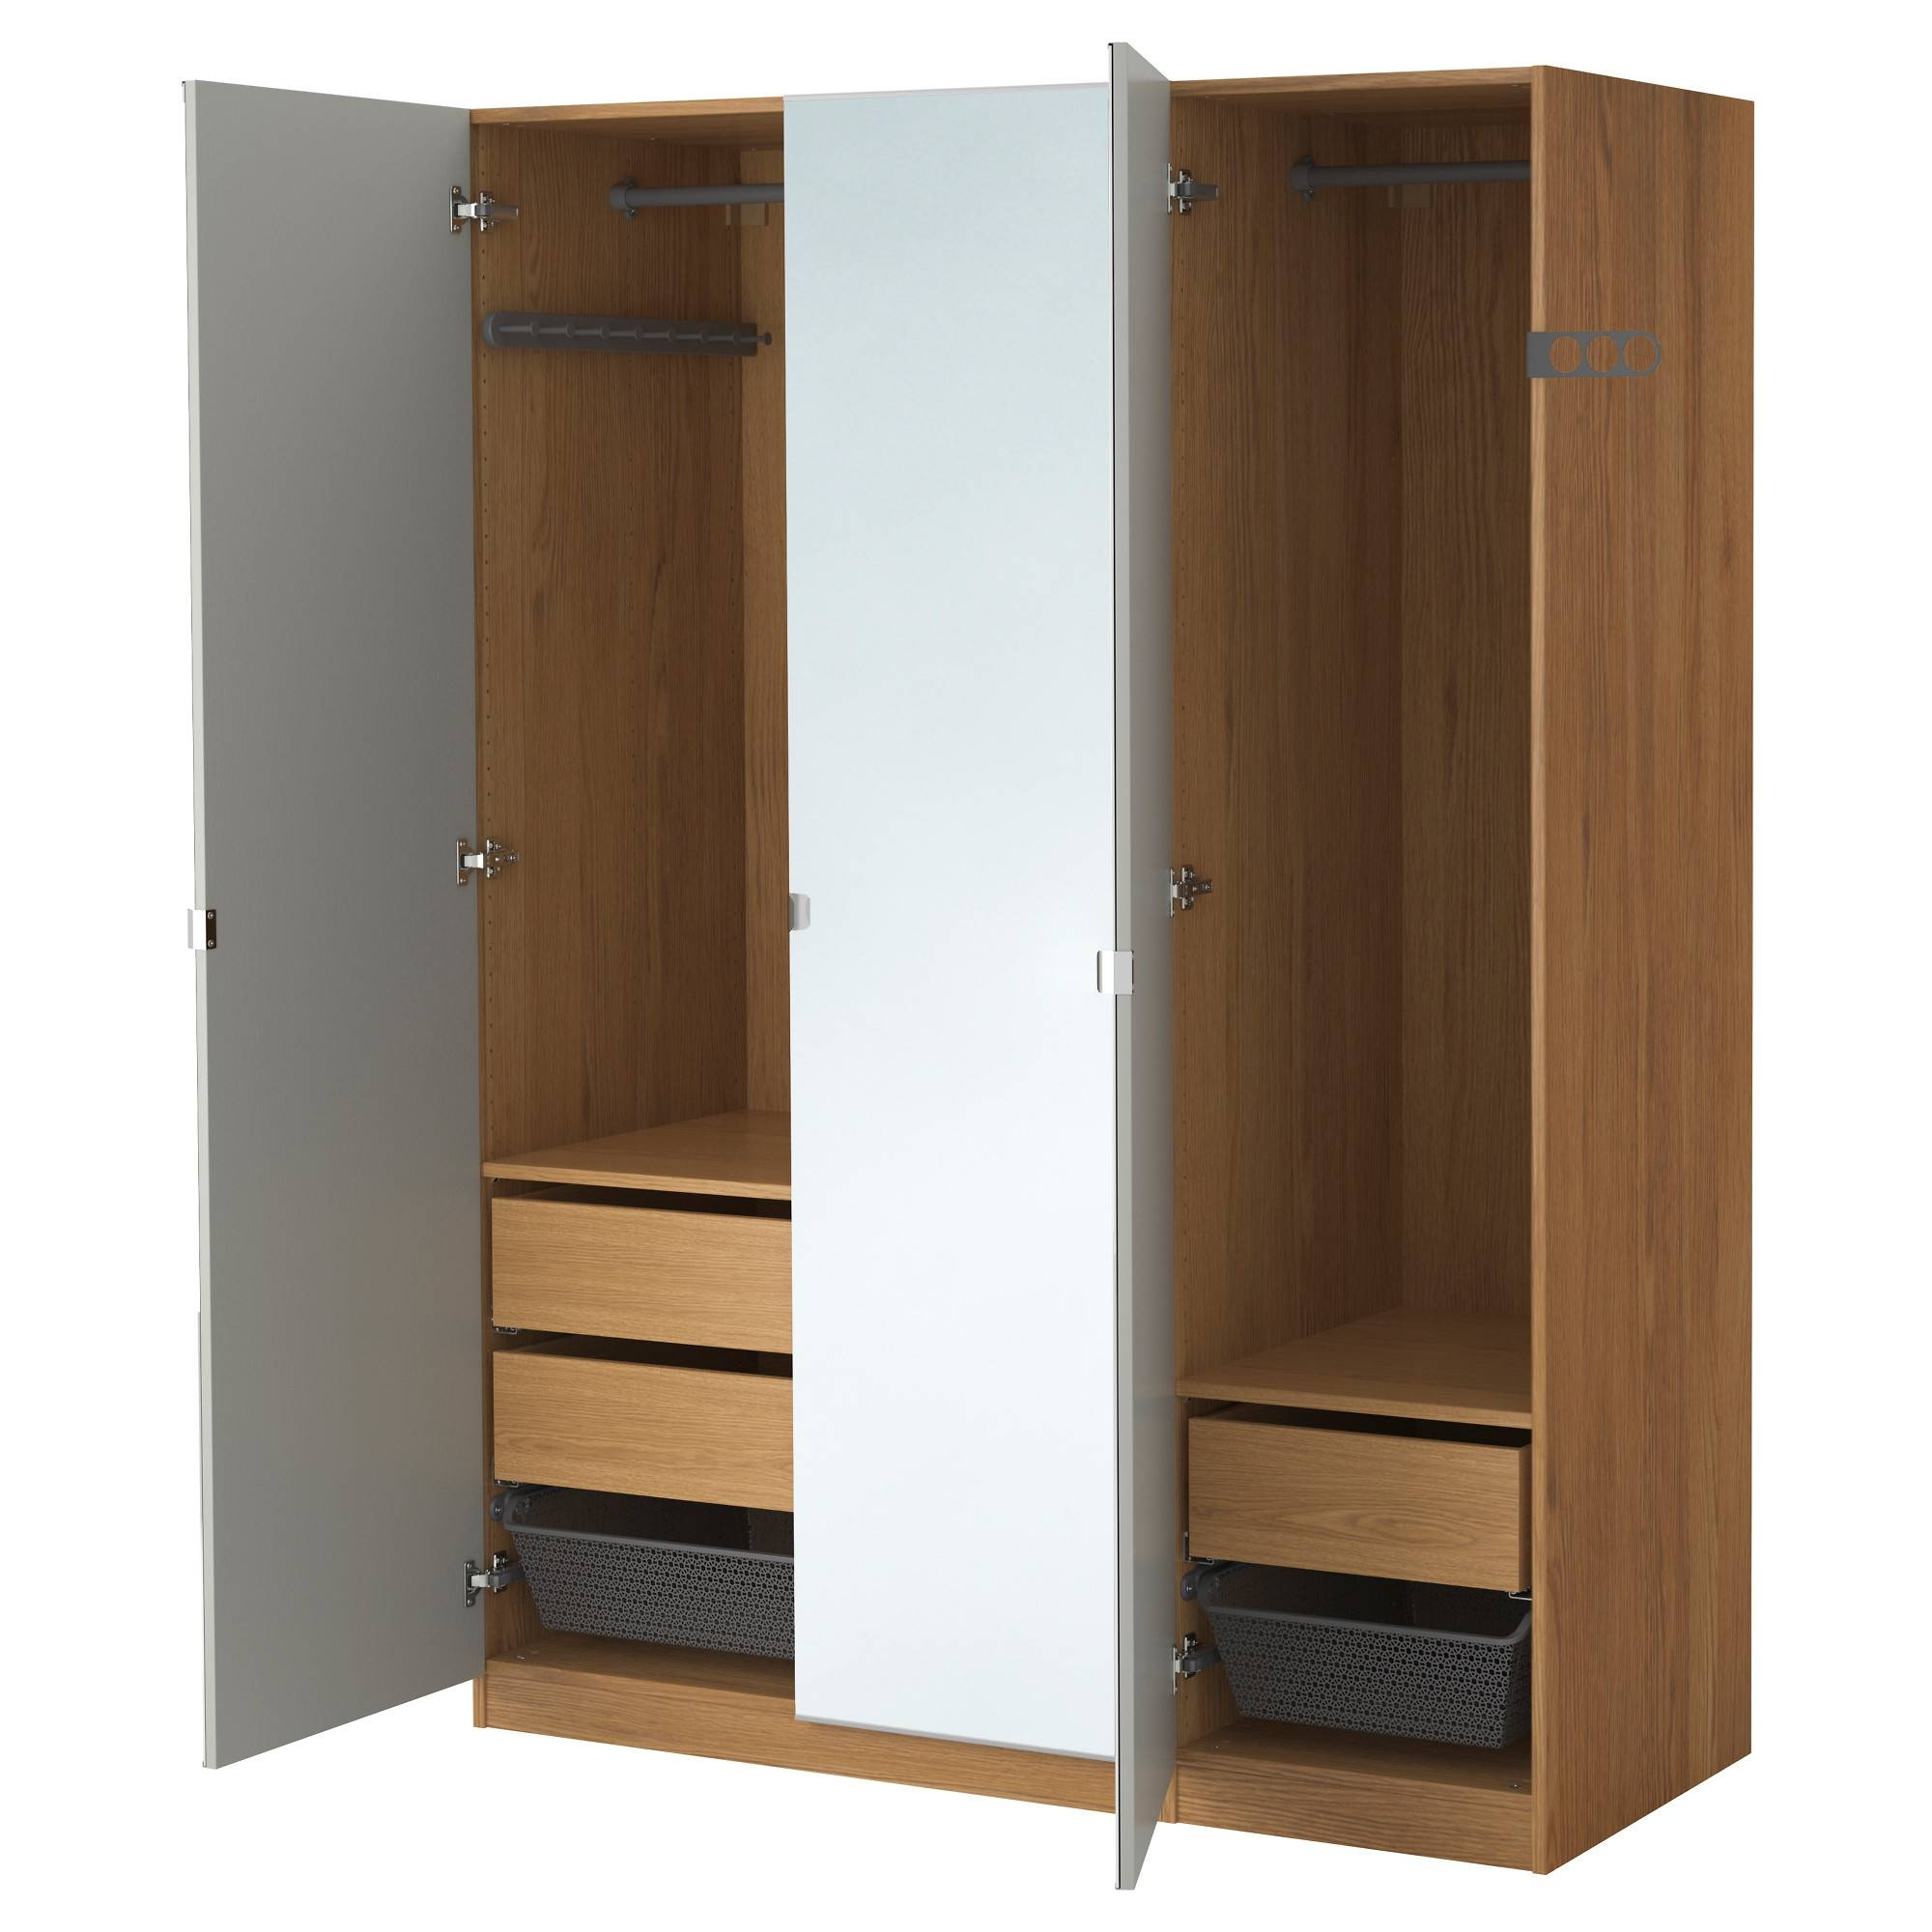 Wardrobes   Ikea Inside Single Door Mirrored Wardrobes (View 15 of 15)